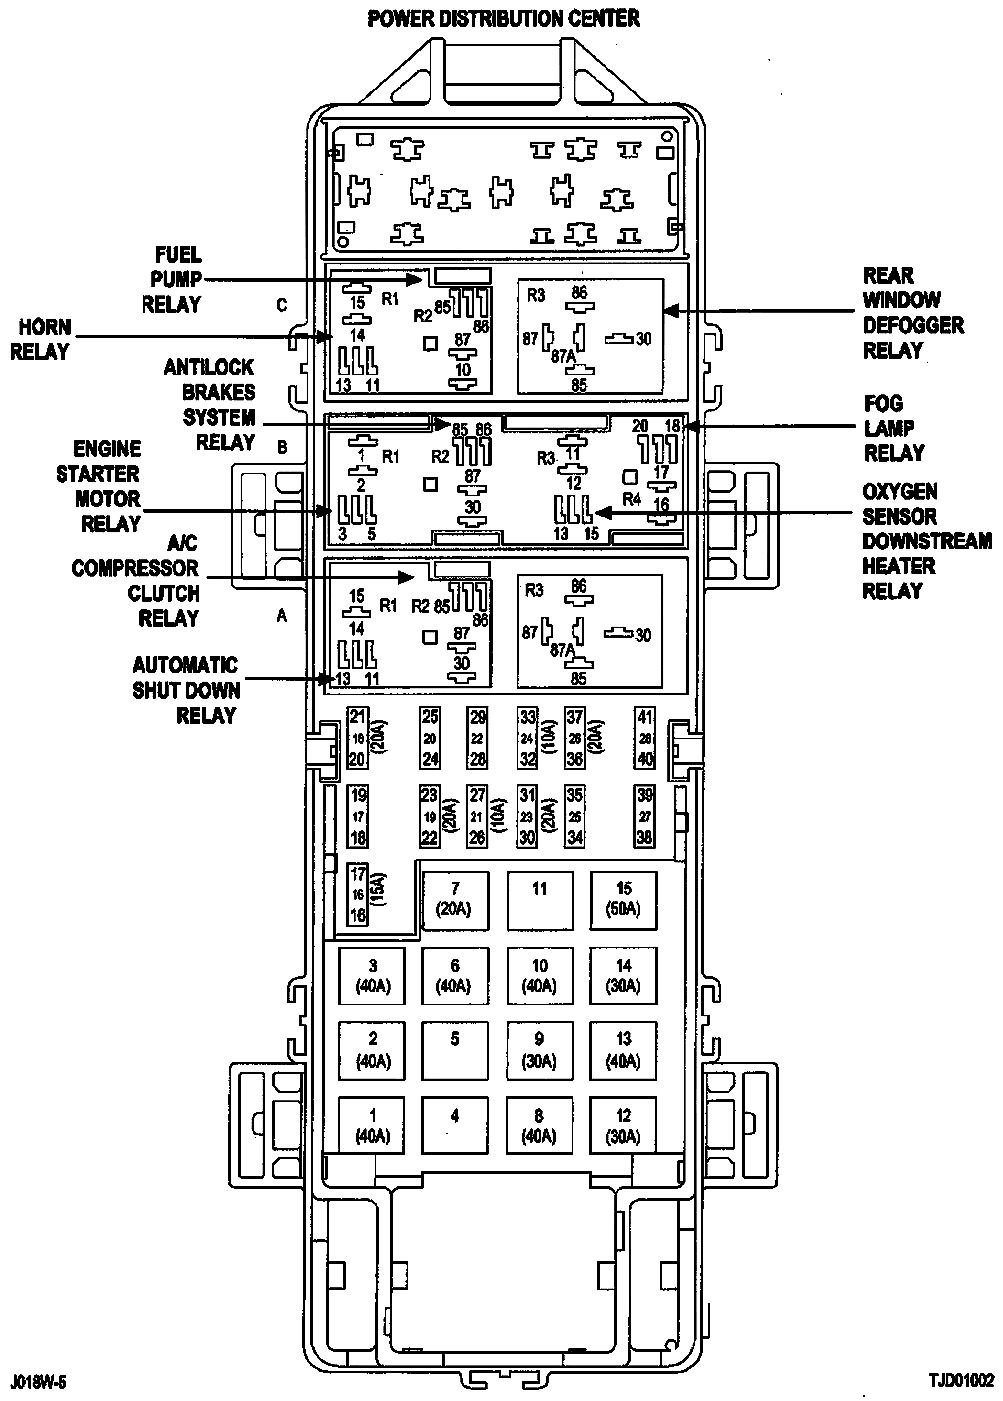 Jeep Wrangler Tj Fuse Box Diagram / Tj Fuse Box Interior